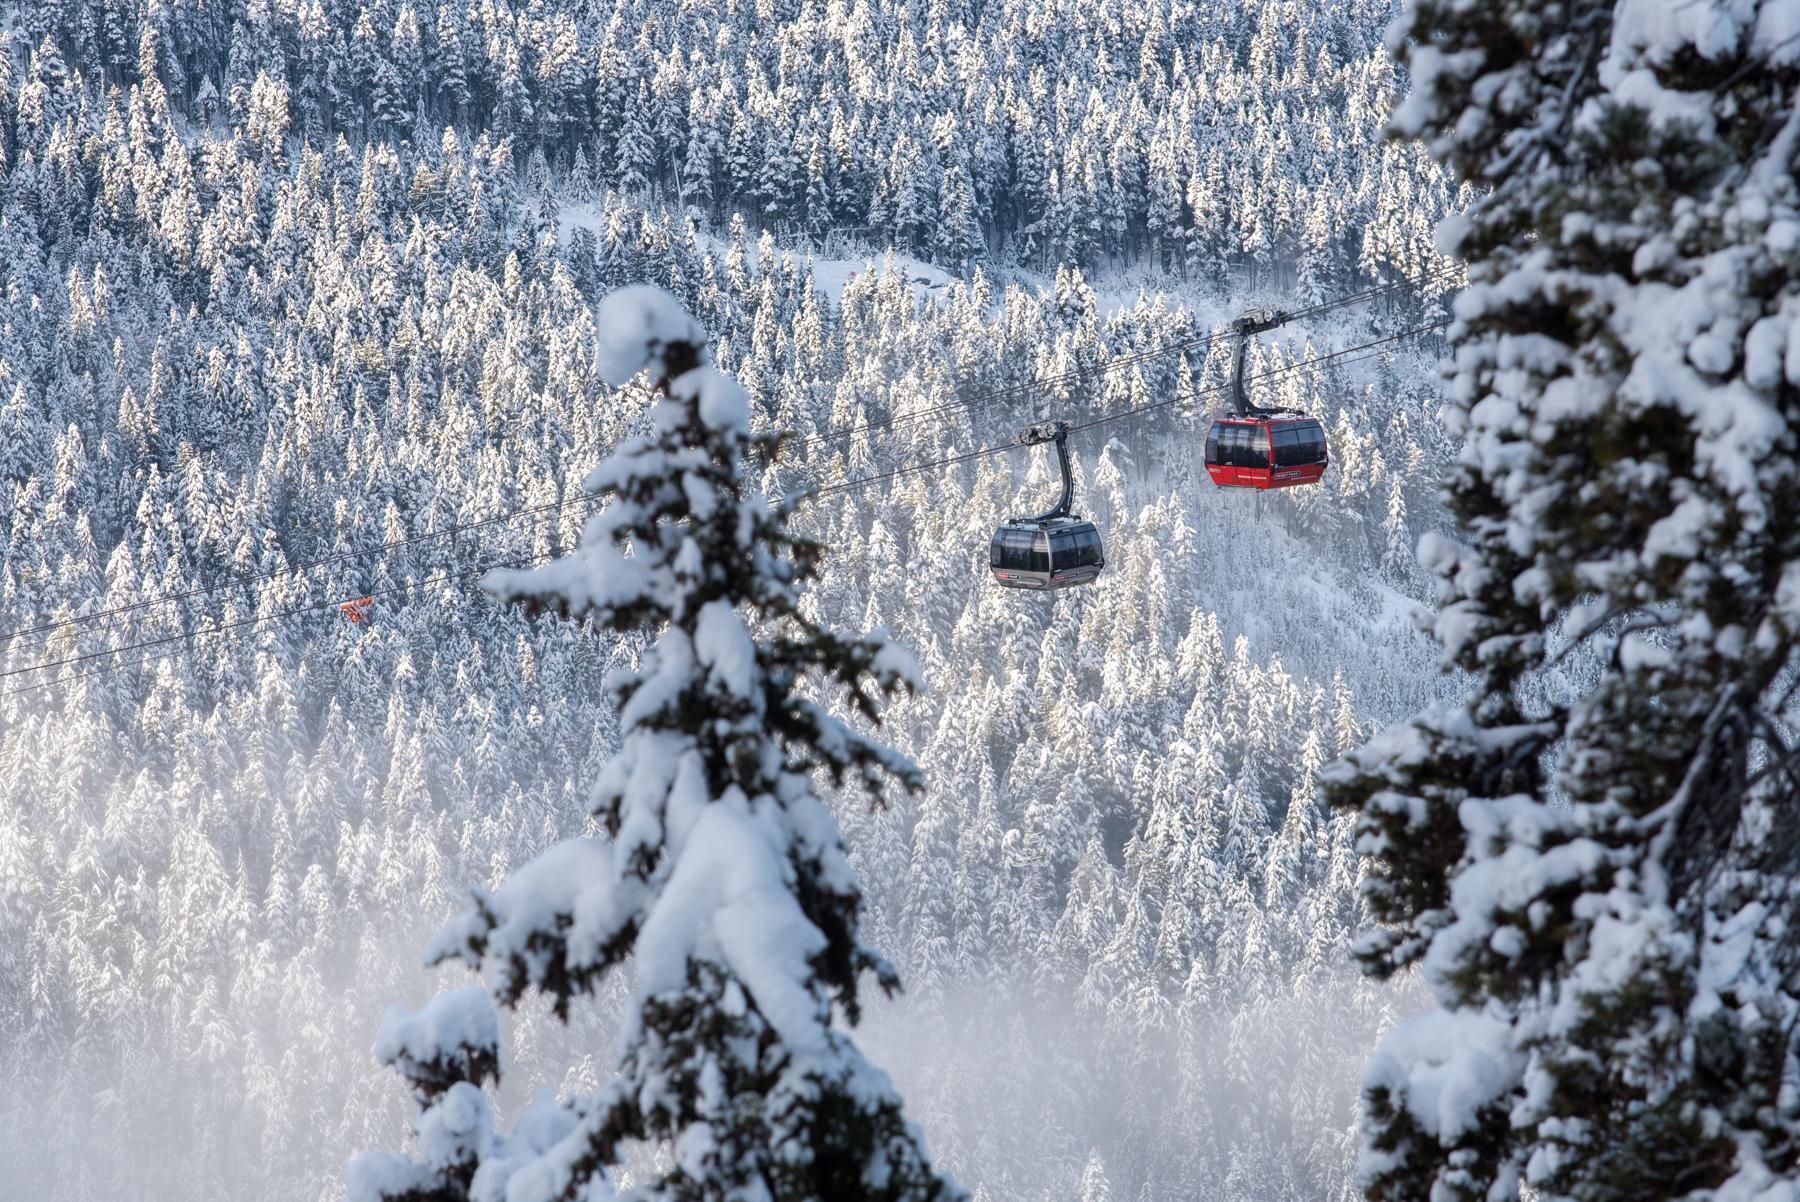 The Whistler Blackcomb slopes/David McColm, taken on Dec 30, 2015